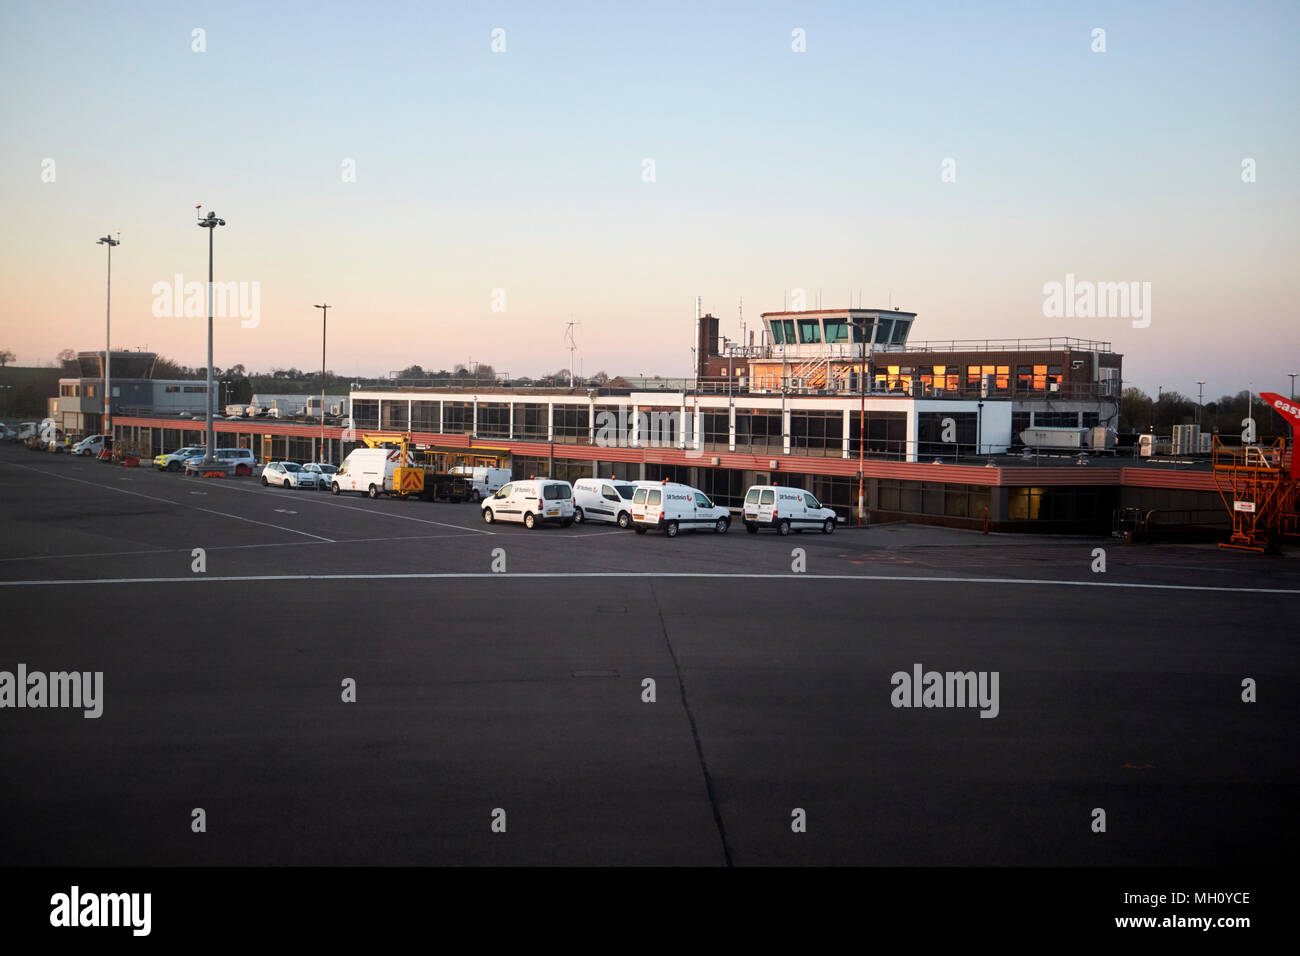 SR Technics civil aviation services at bristol airport england uk - Stock Image